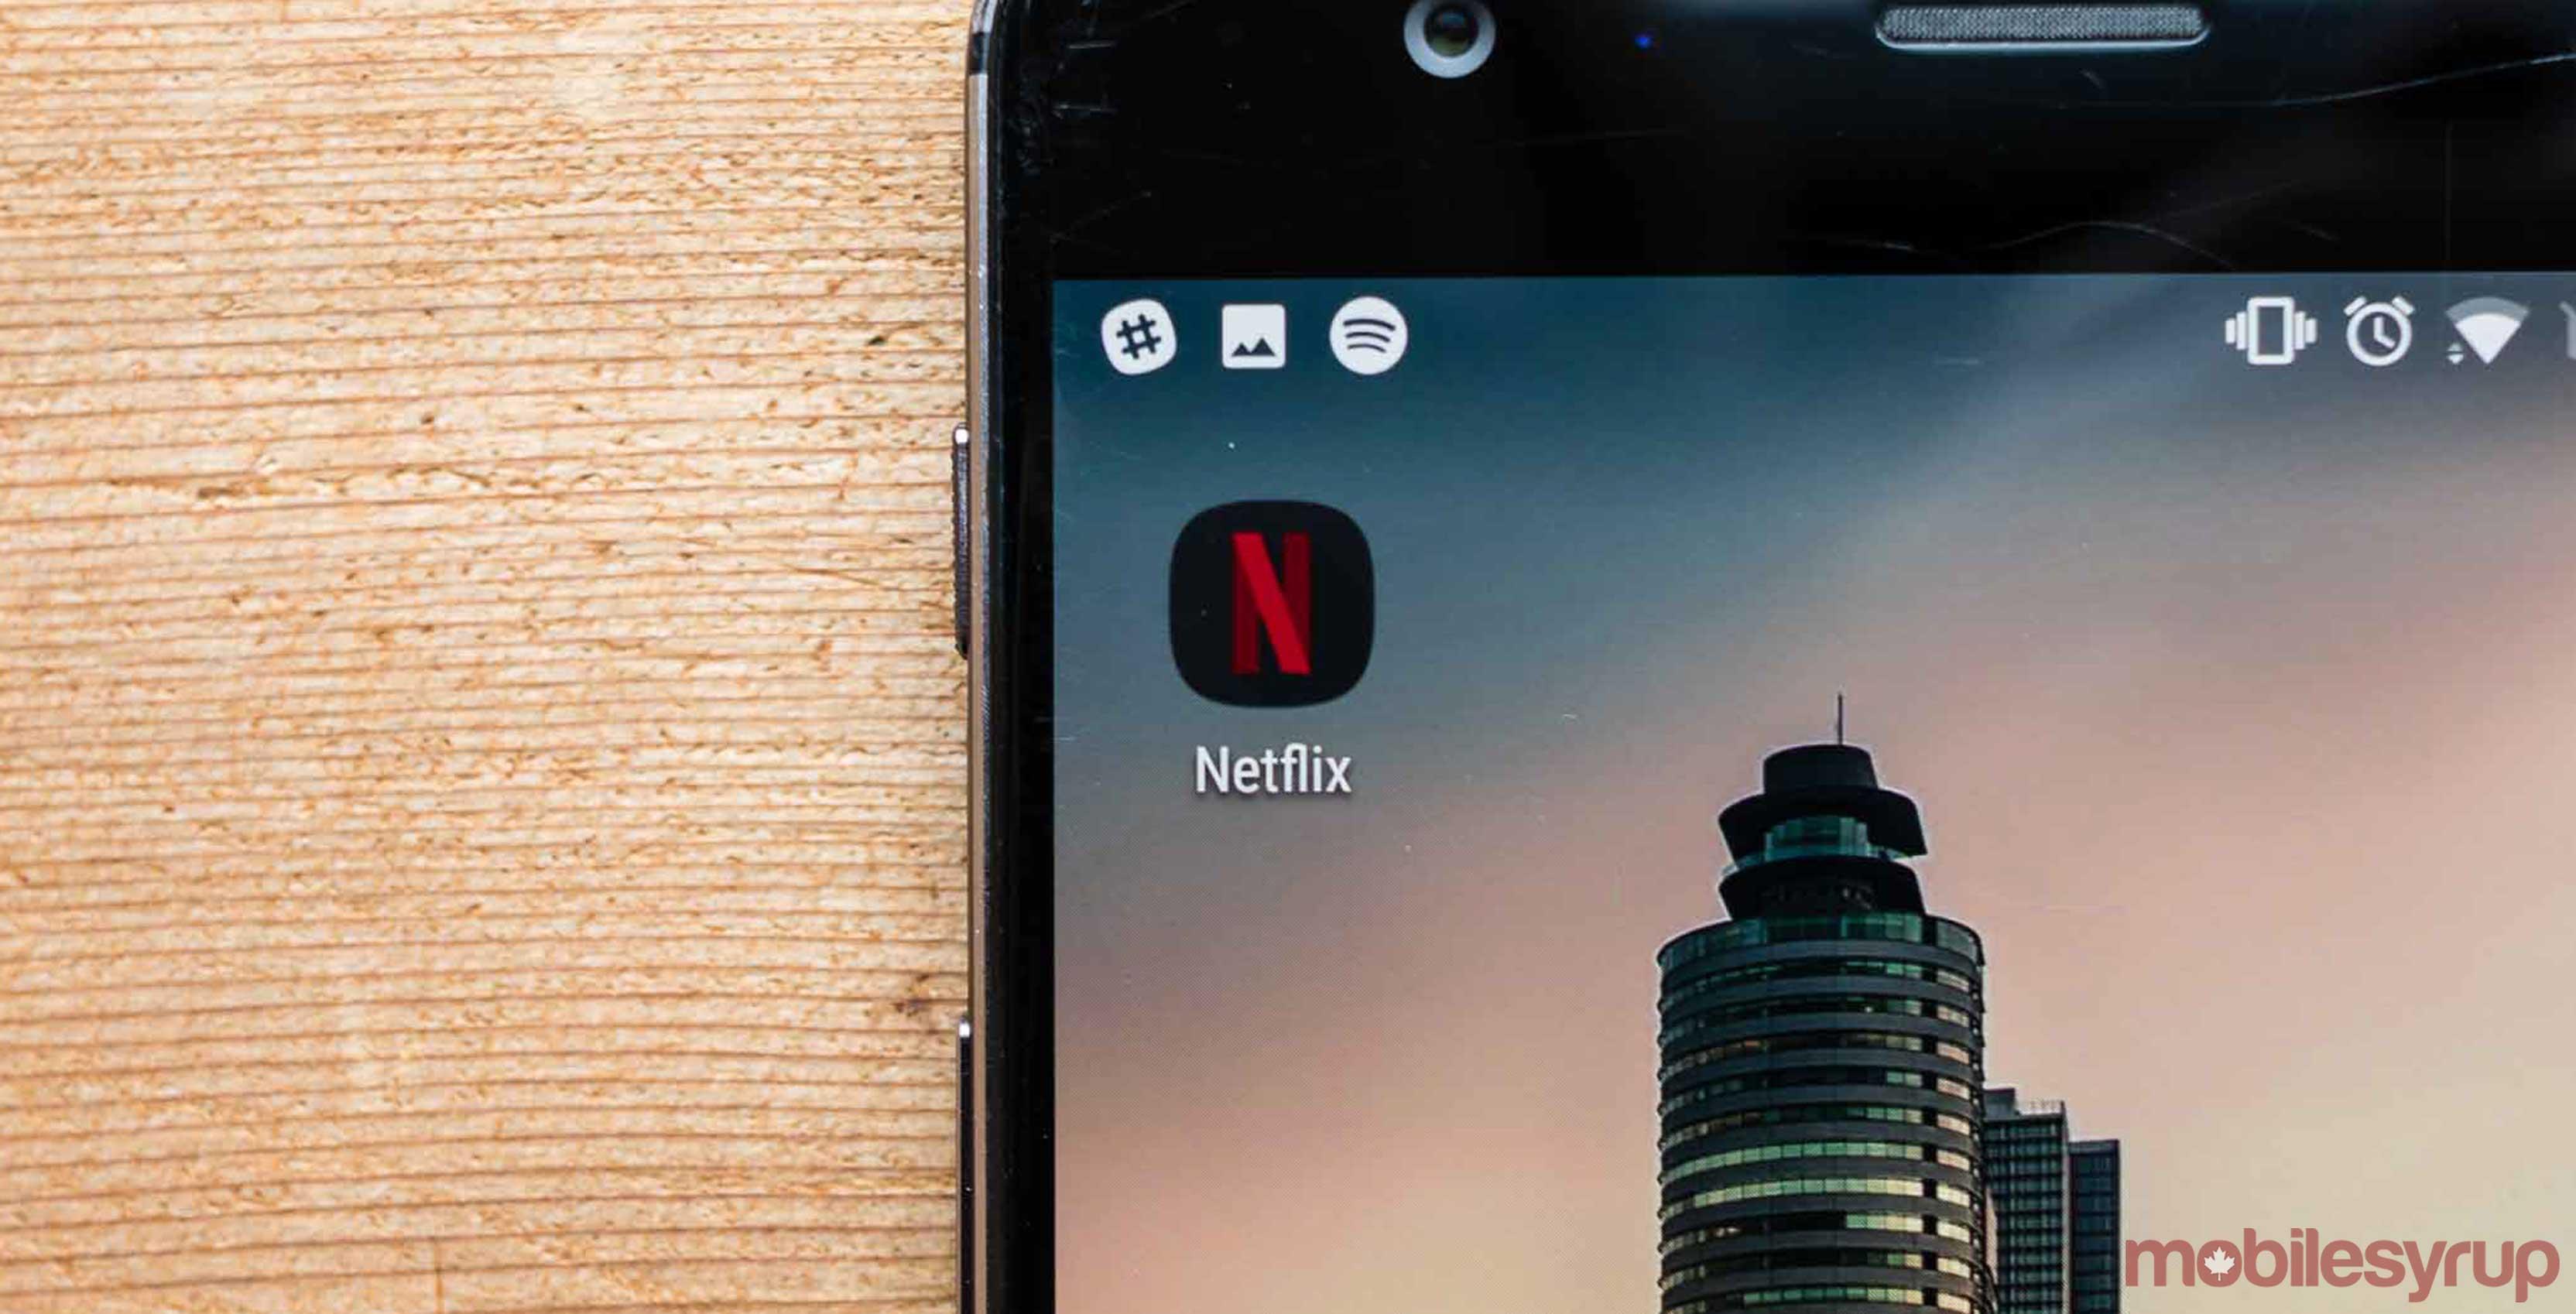 Netflix app on phone